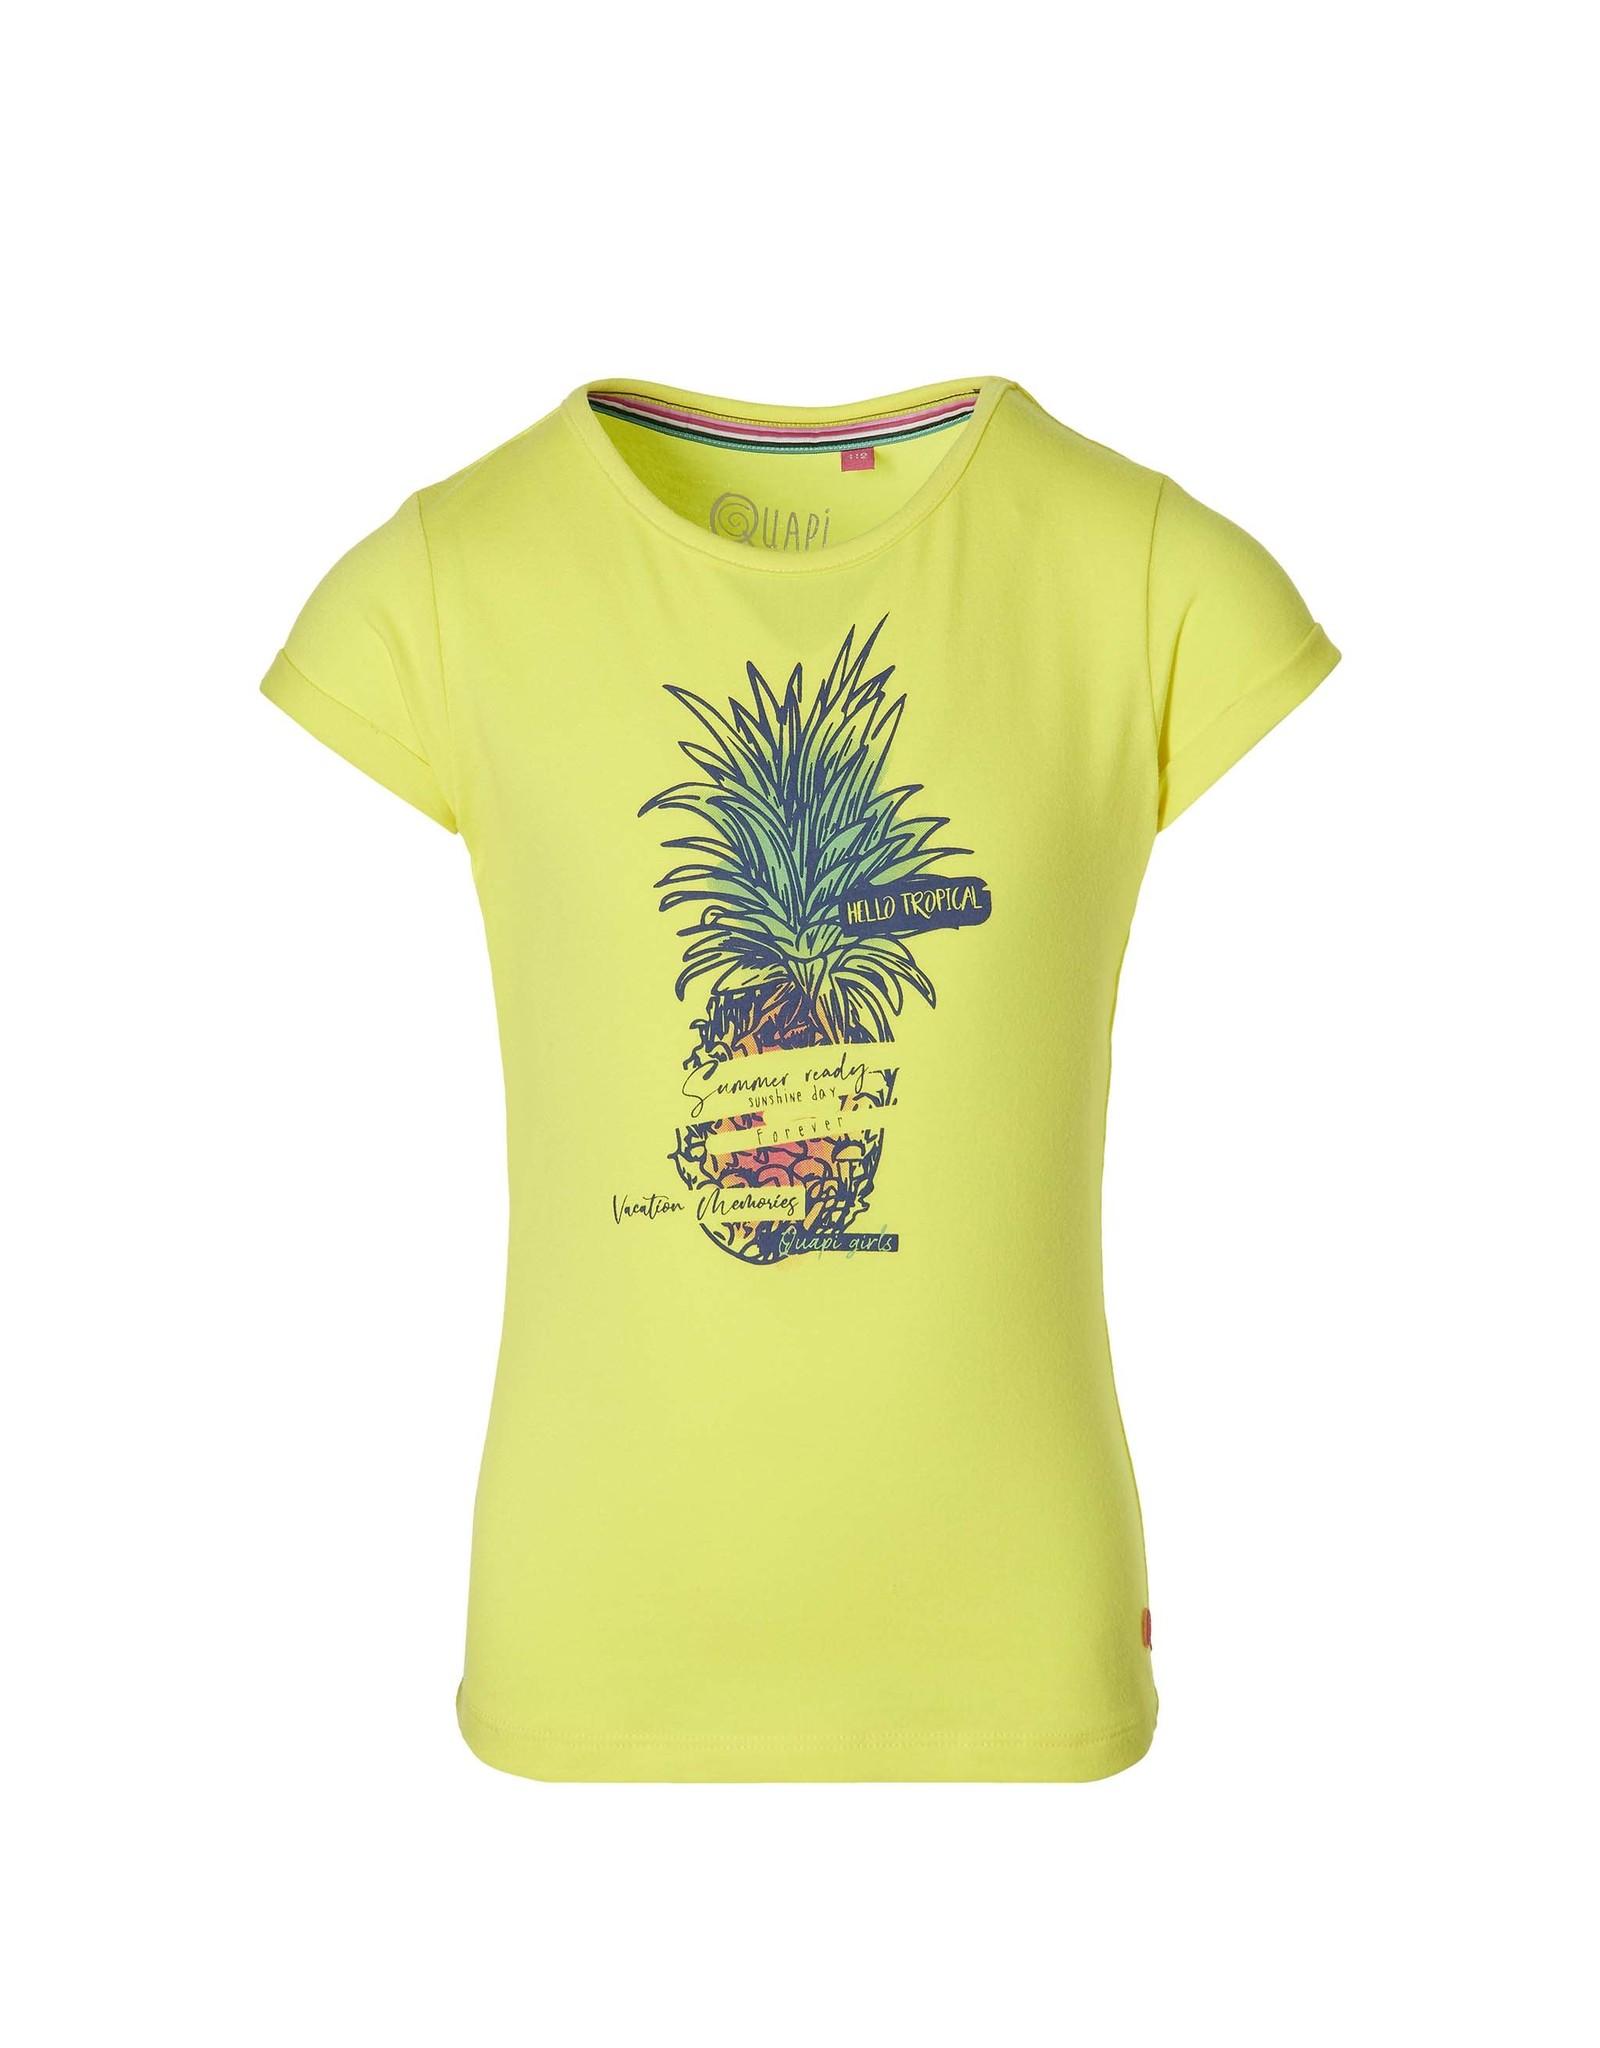 Quapi Quapi meisjes t-shirt Fauna Lemon Yellow